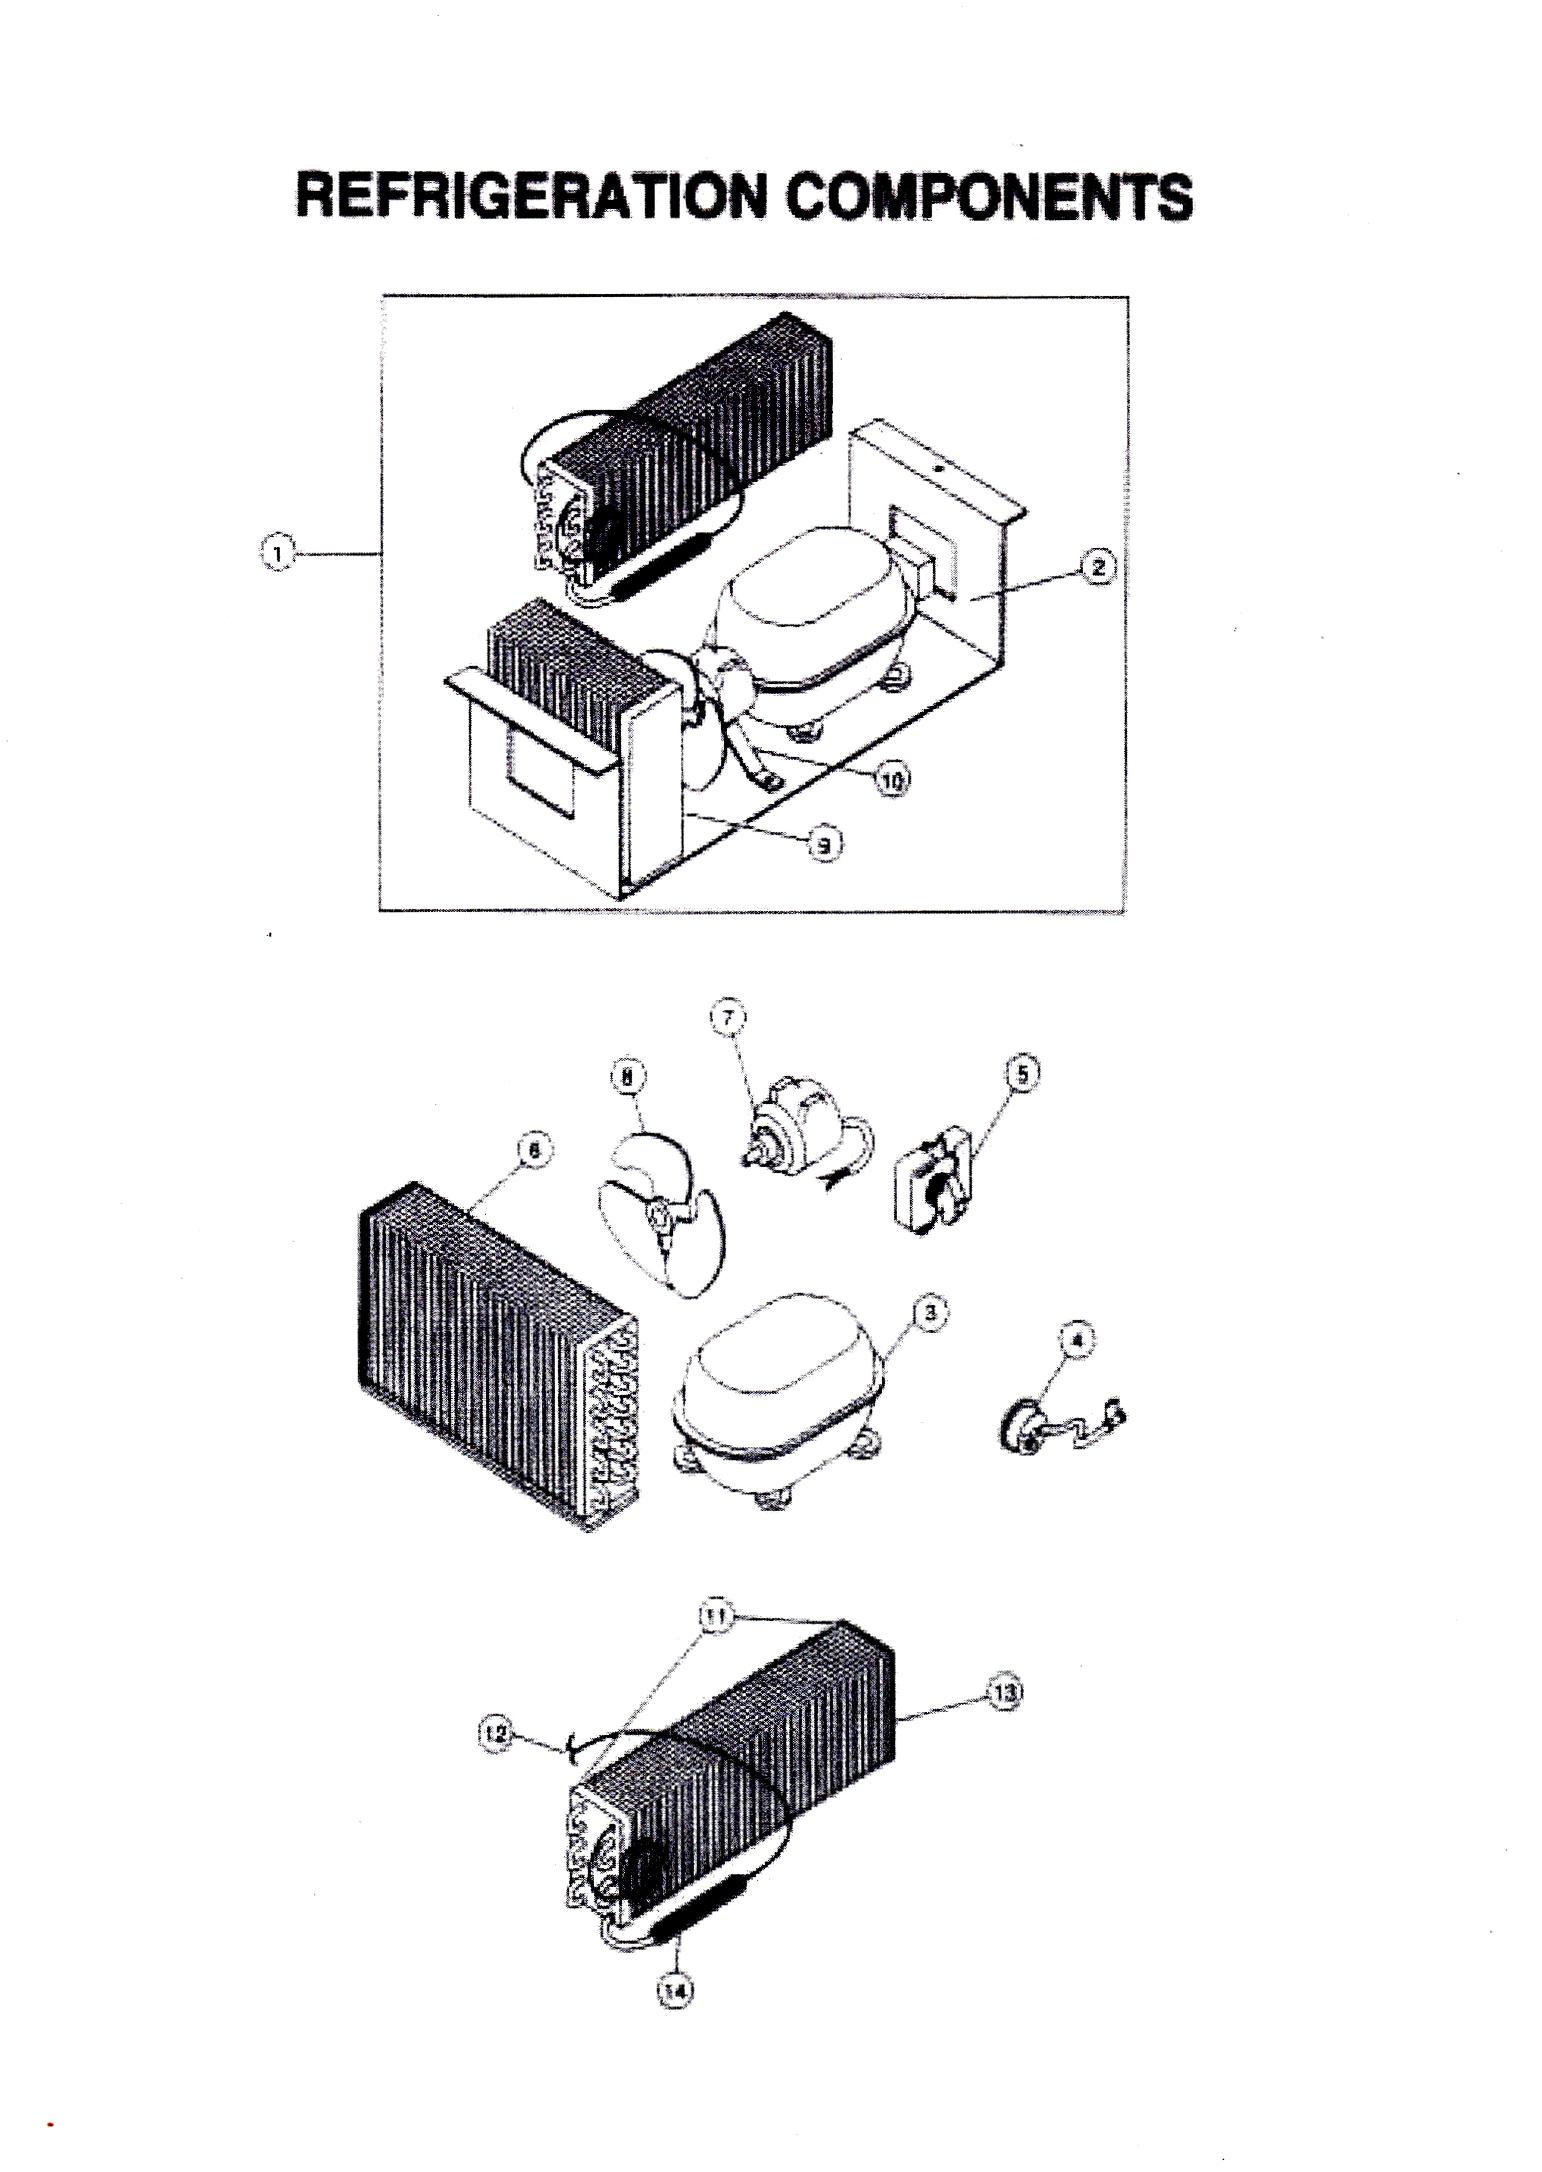 Wiring Diagram 31 Beverage Air Bm23 Parts Diagram